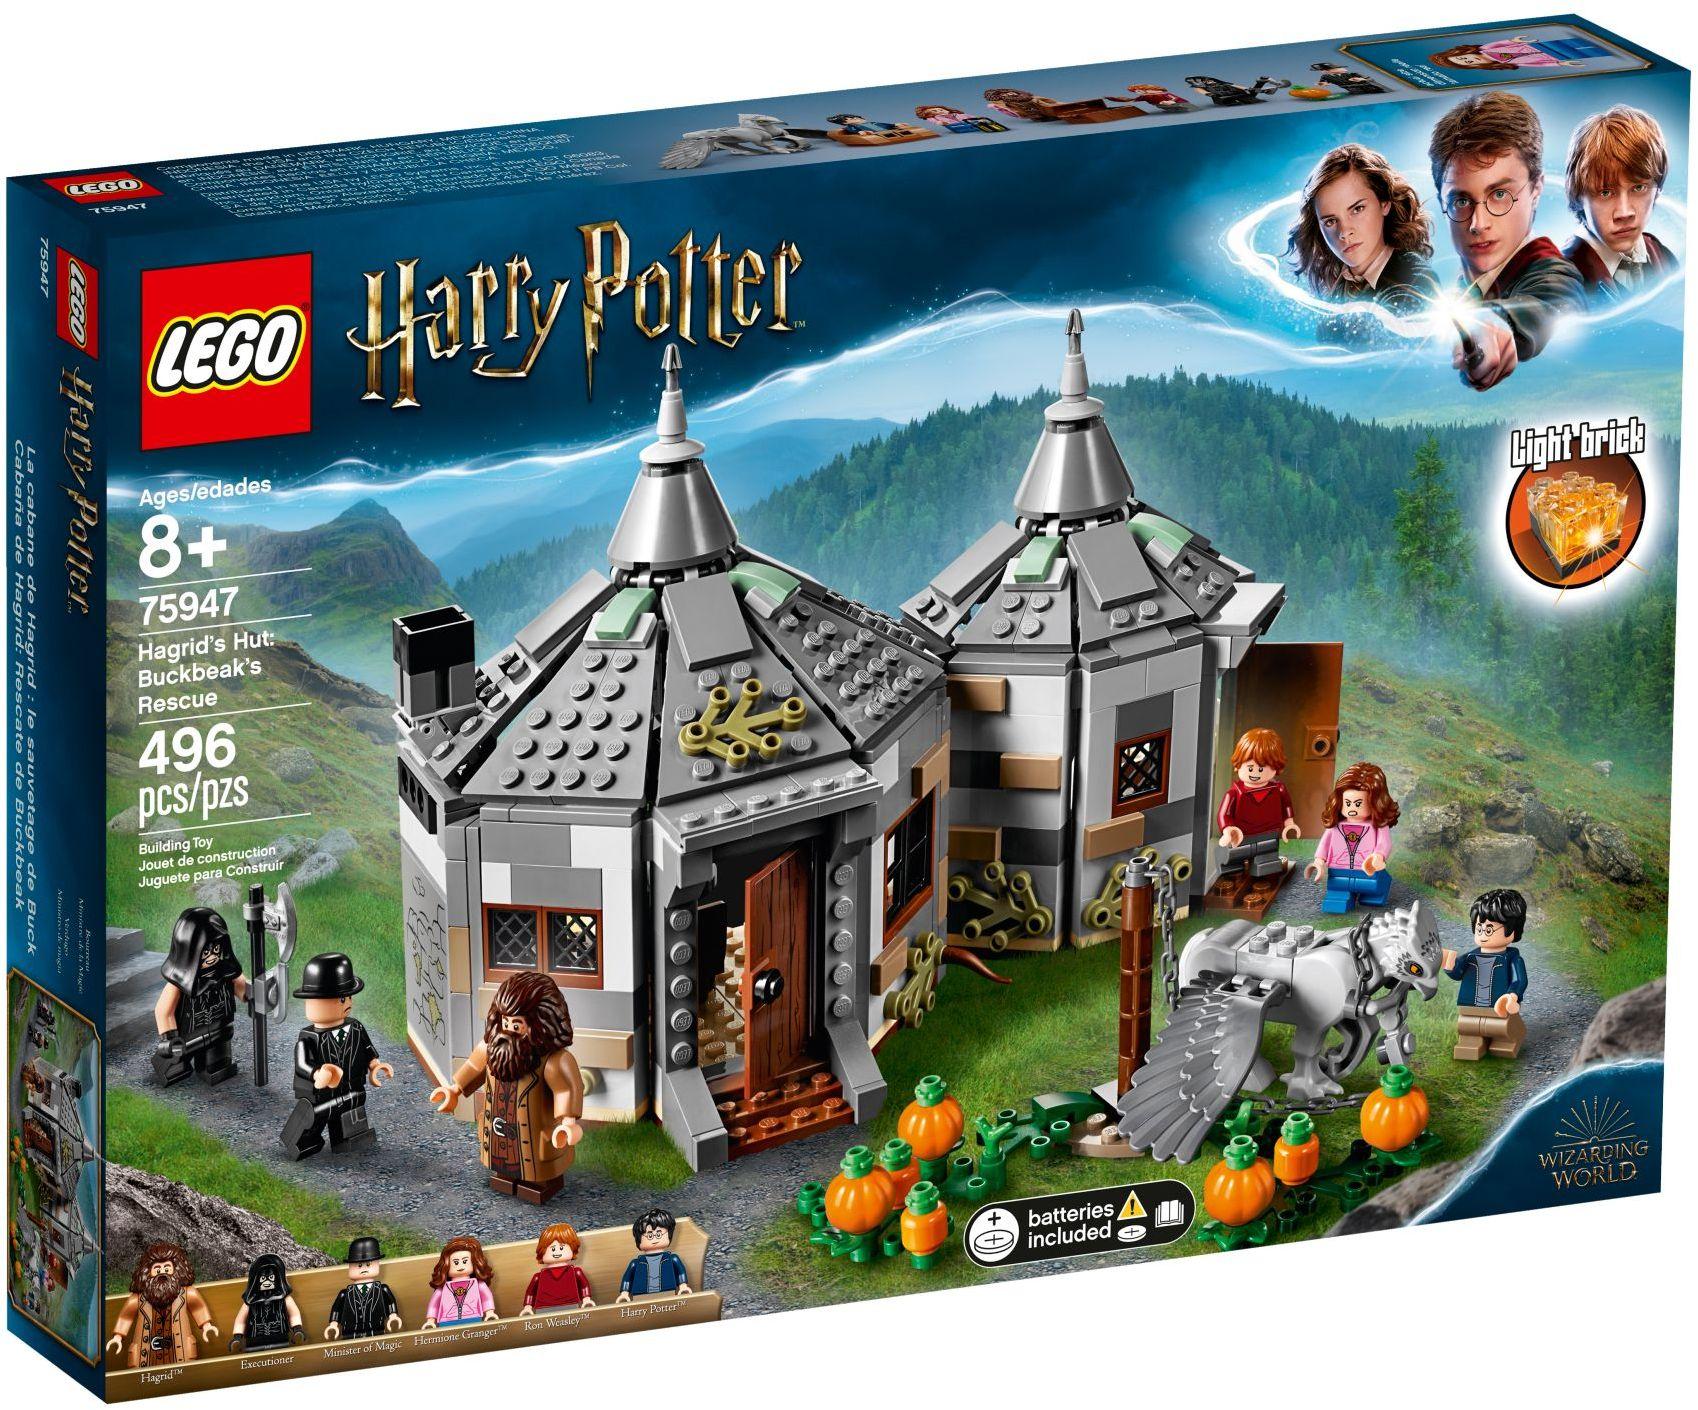 LEGO Harry Potter - Hagrid's Hut: Buckbeak's Rescue (75947)